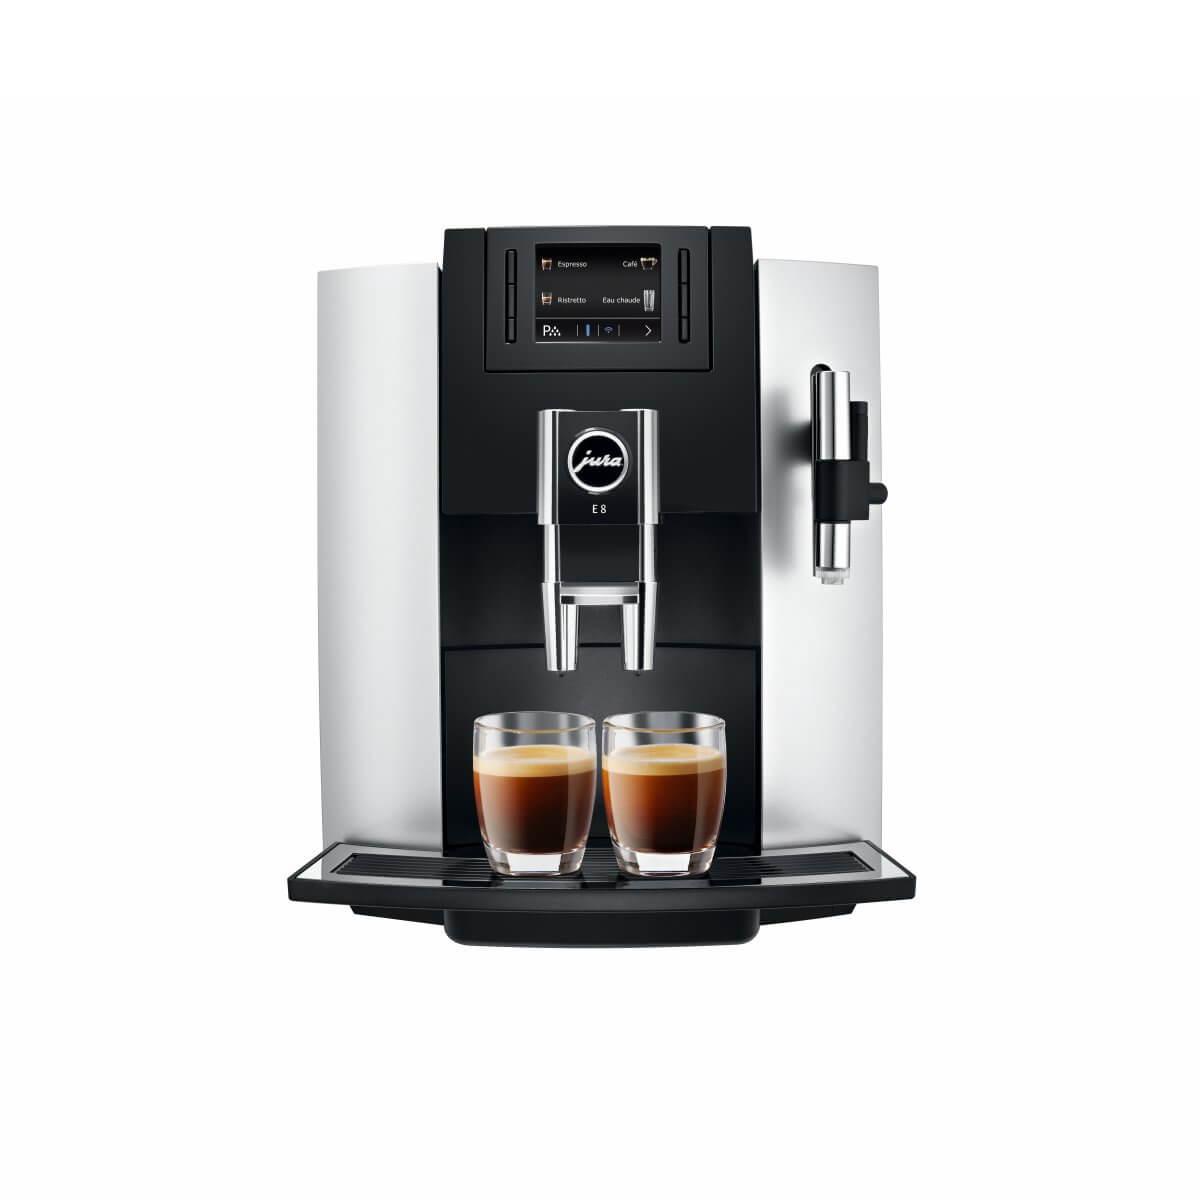 jura e8 platine p e p 2017 garantie 3 ans machine caf automatique caf s pfaff. Black Bedroom Furniture Sets. Home Design Ideas